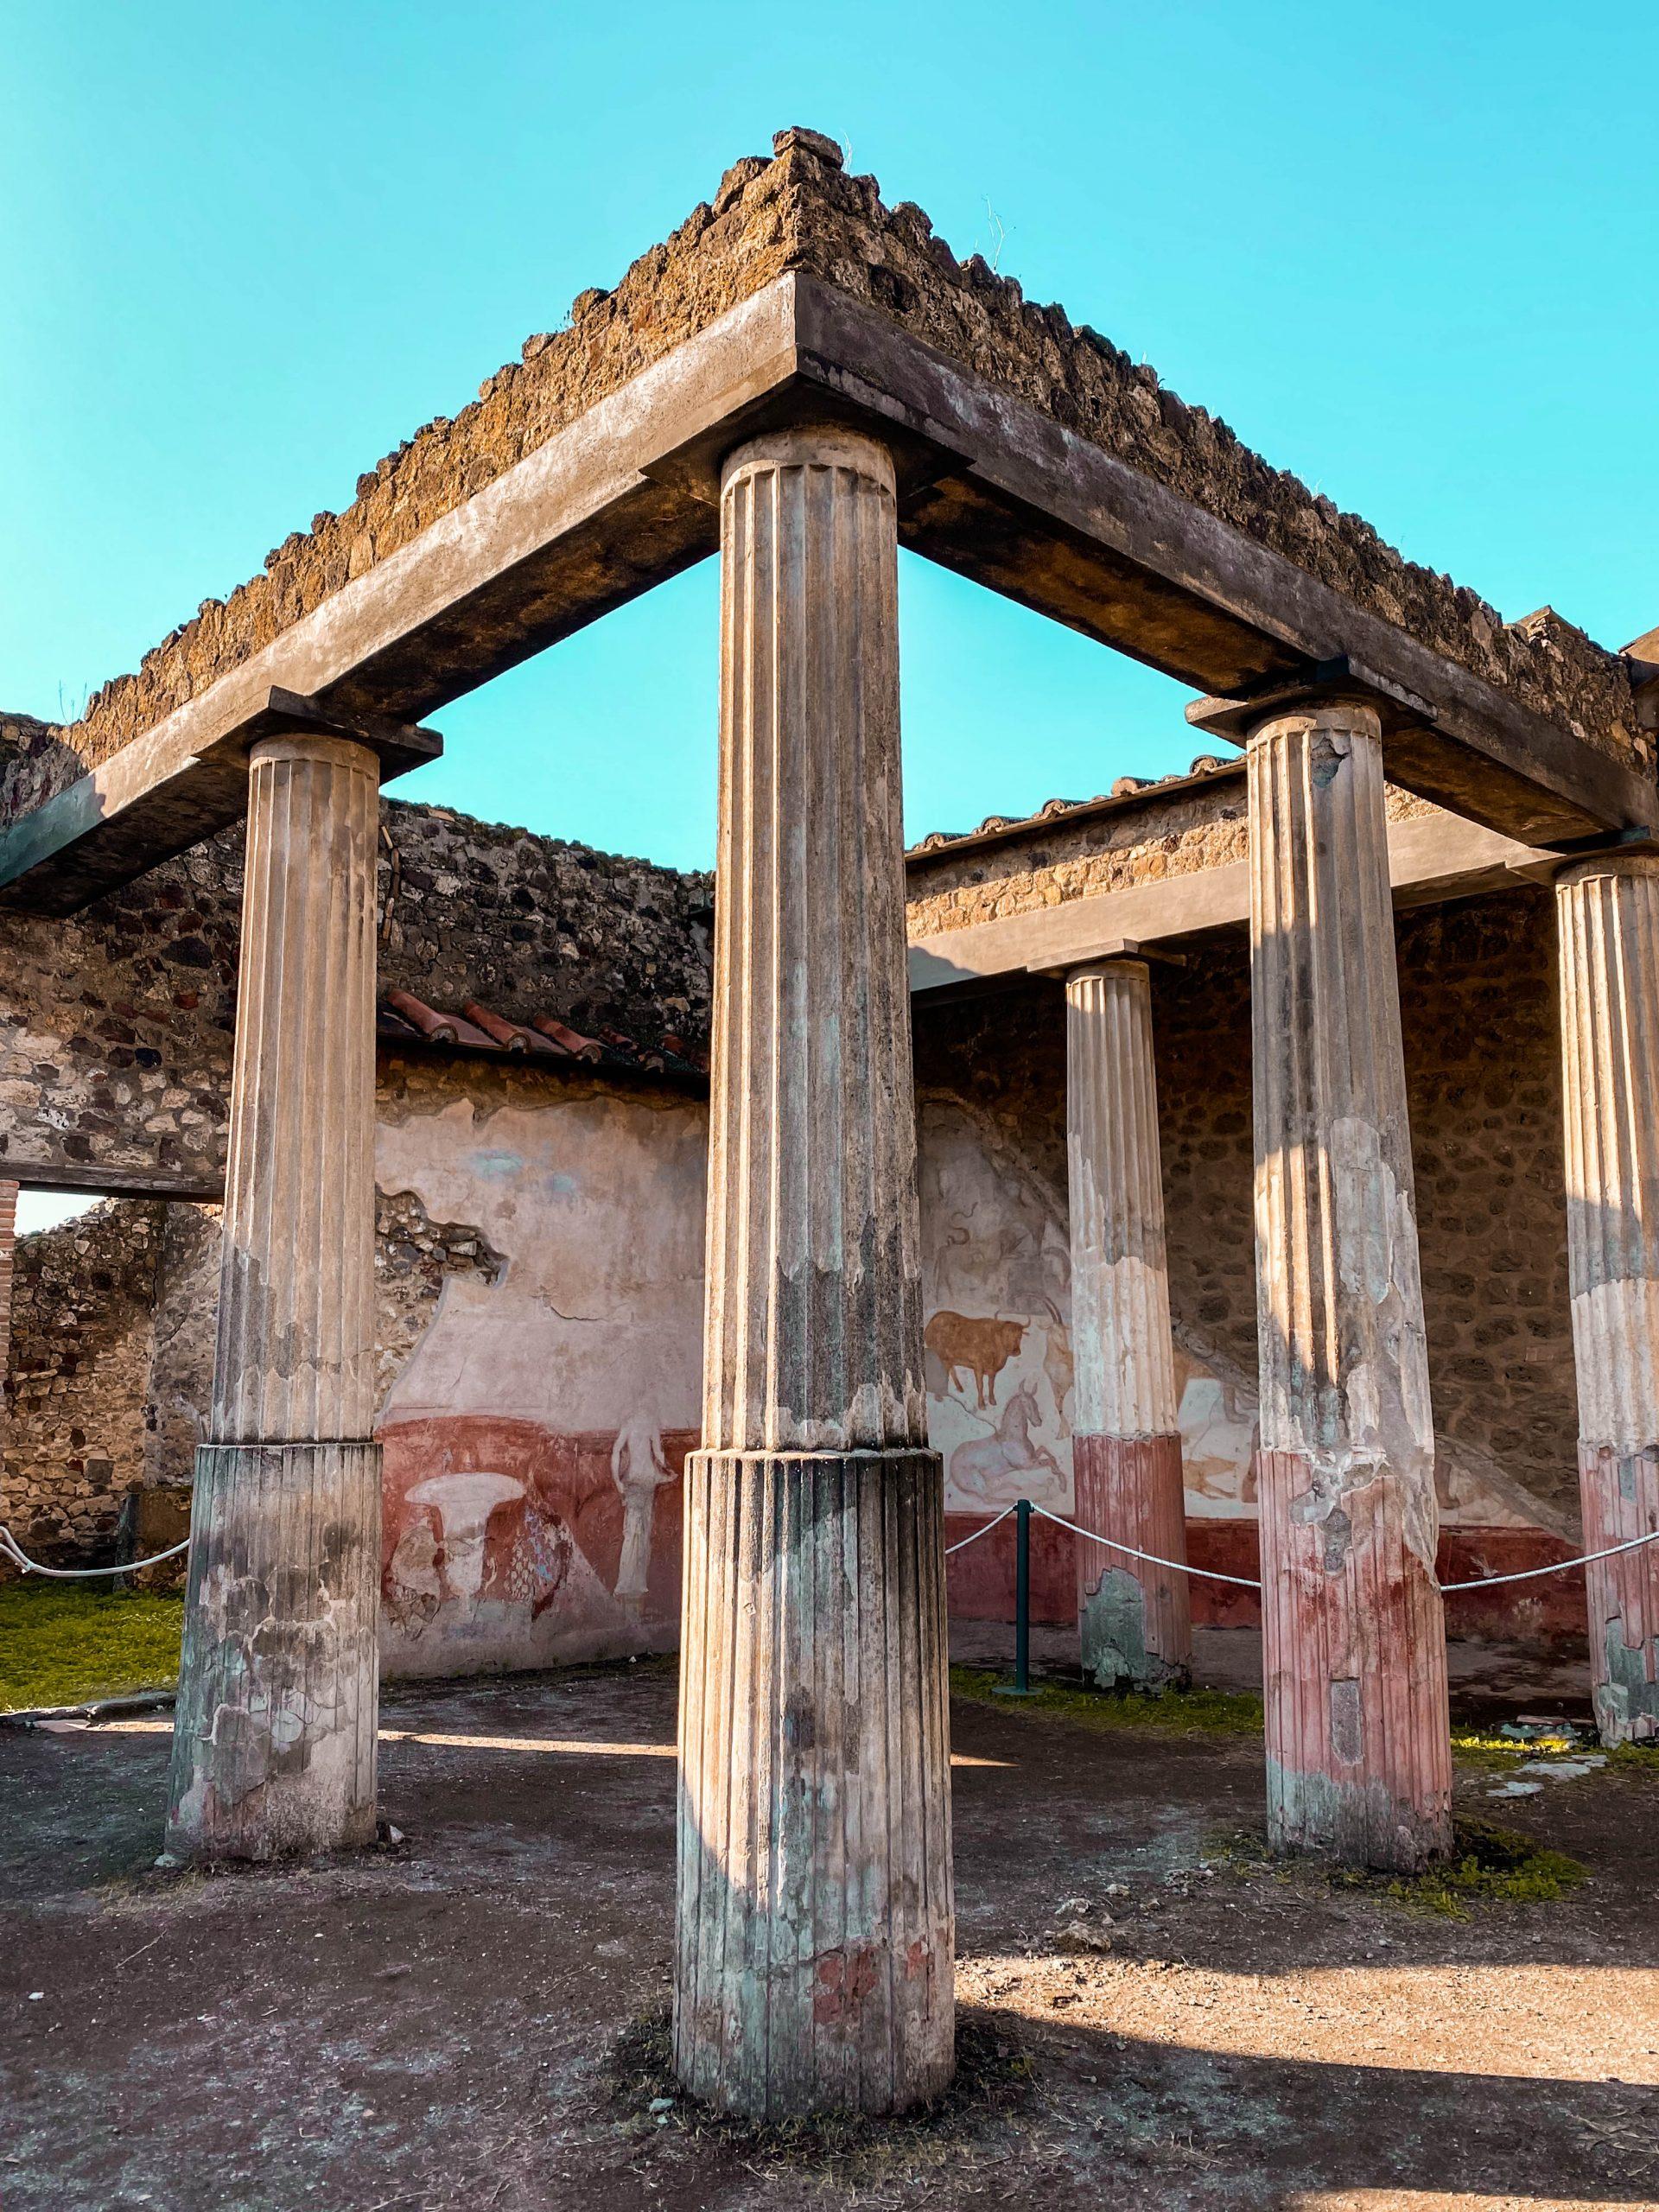 casa di romolo e remo house of romulus and remus pompeii italy ruins animal fresco pompeian painting columns italy